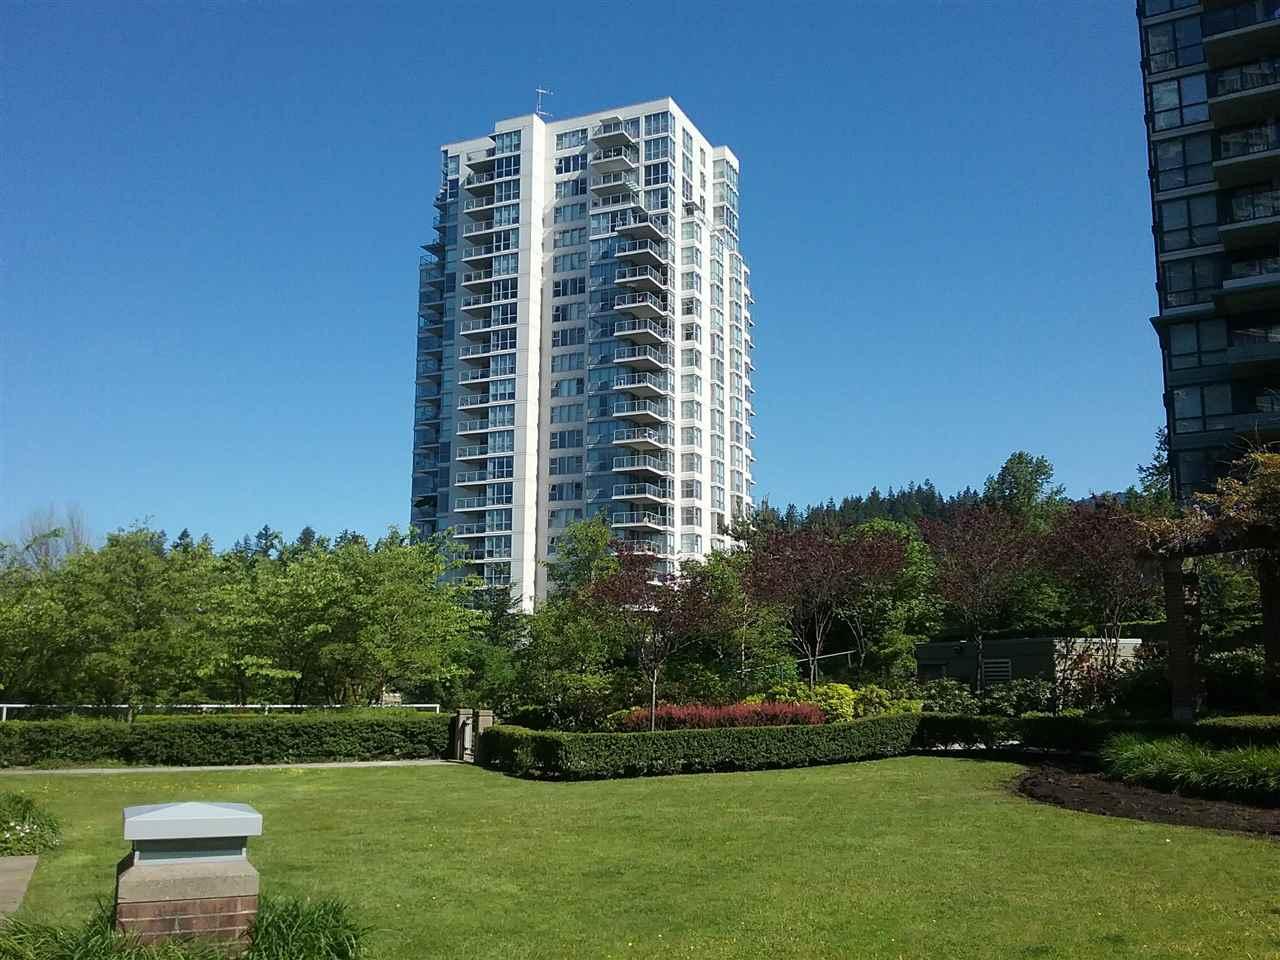 Condo Apartment at 1602 290 NEWPORT DRIVE, Unit 1602, Port Moody, British Columbia. Image 1